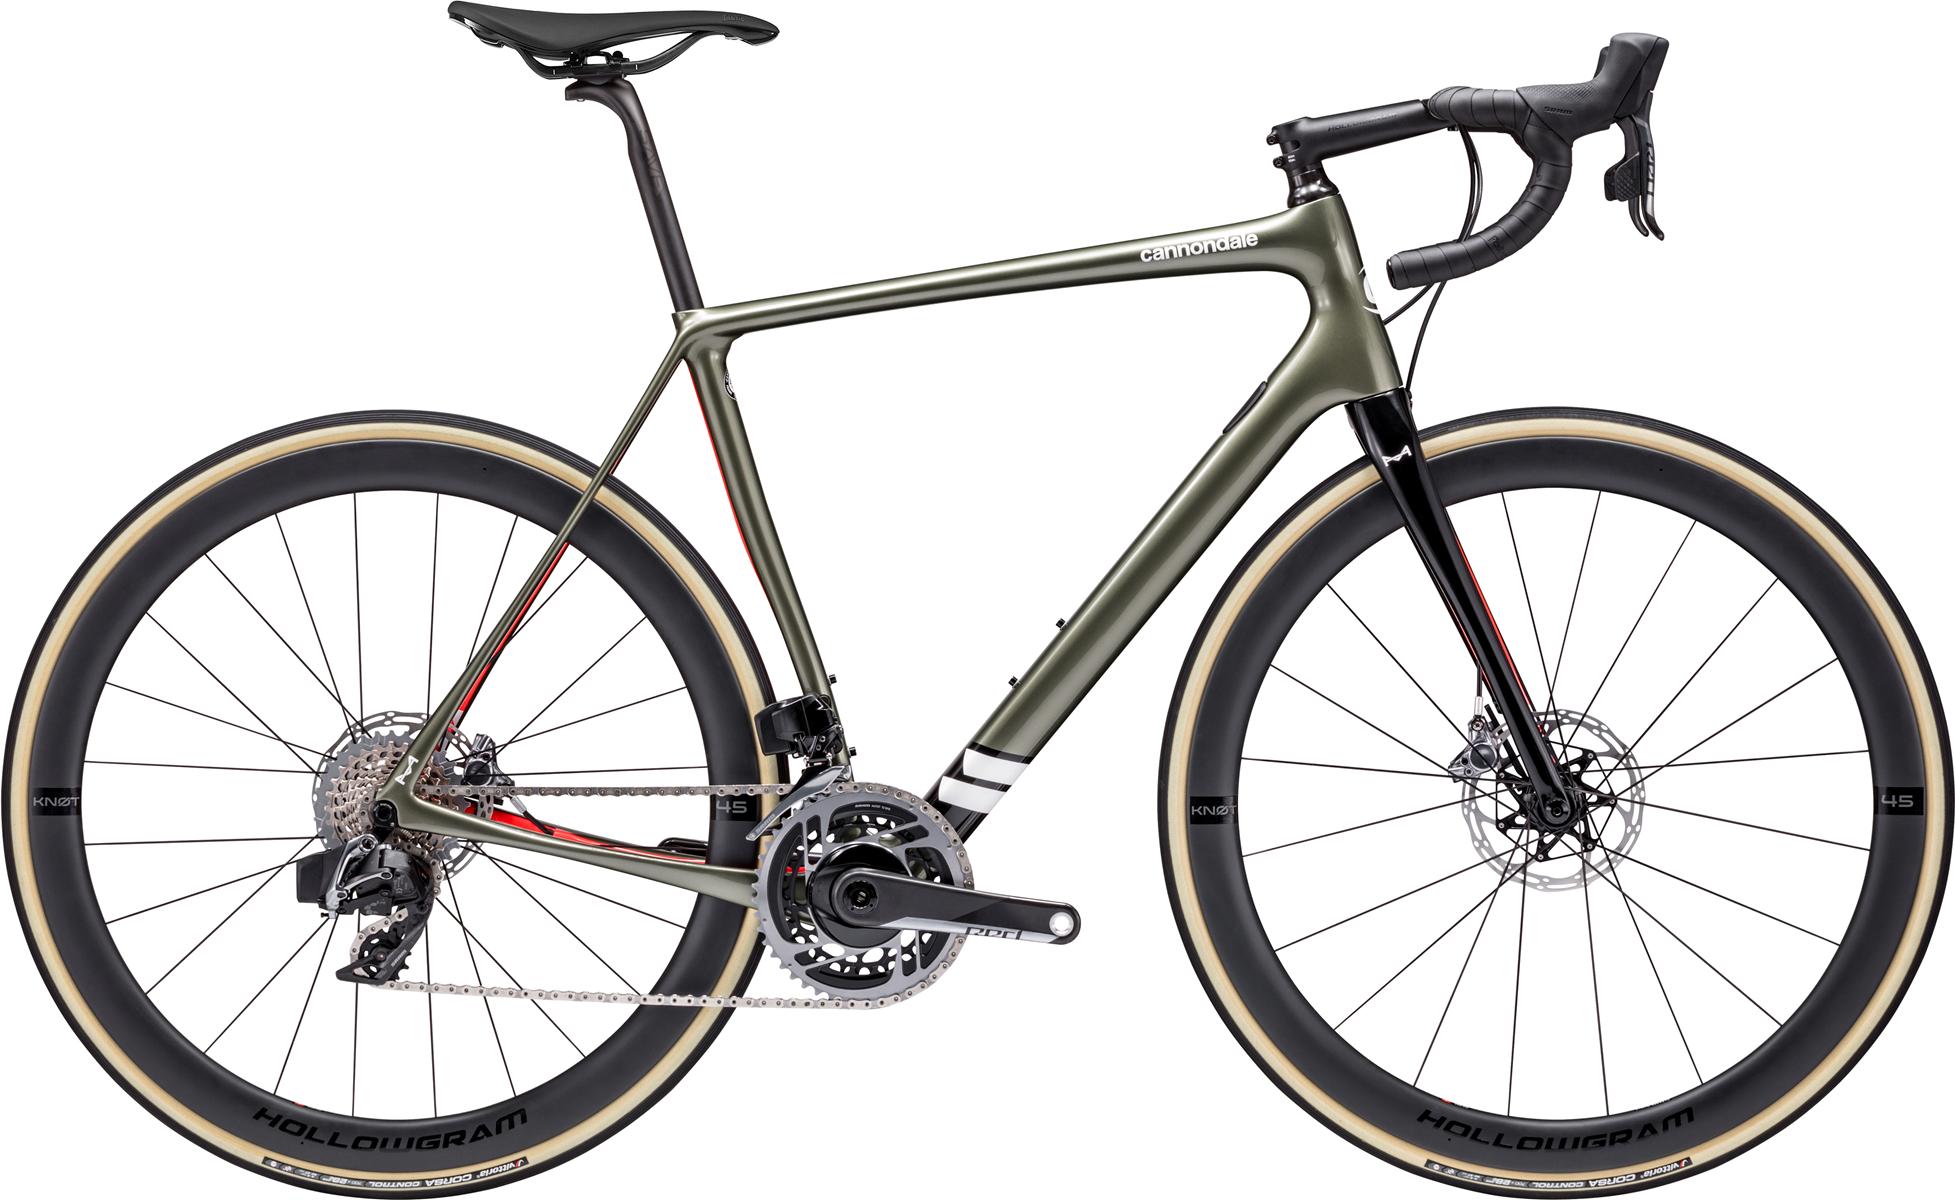 Cannondale Synapse Hi-Mod Sram Red eTap AXS Road Bike 3030 Mantis